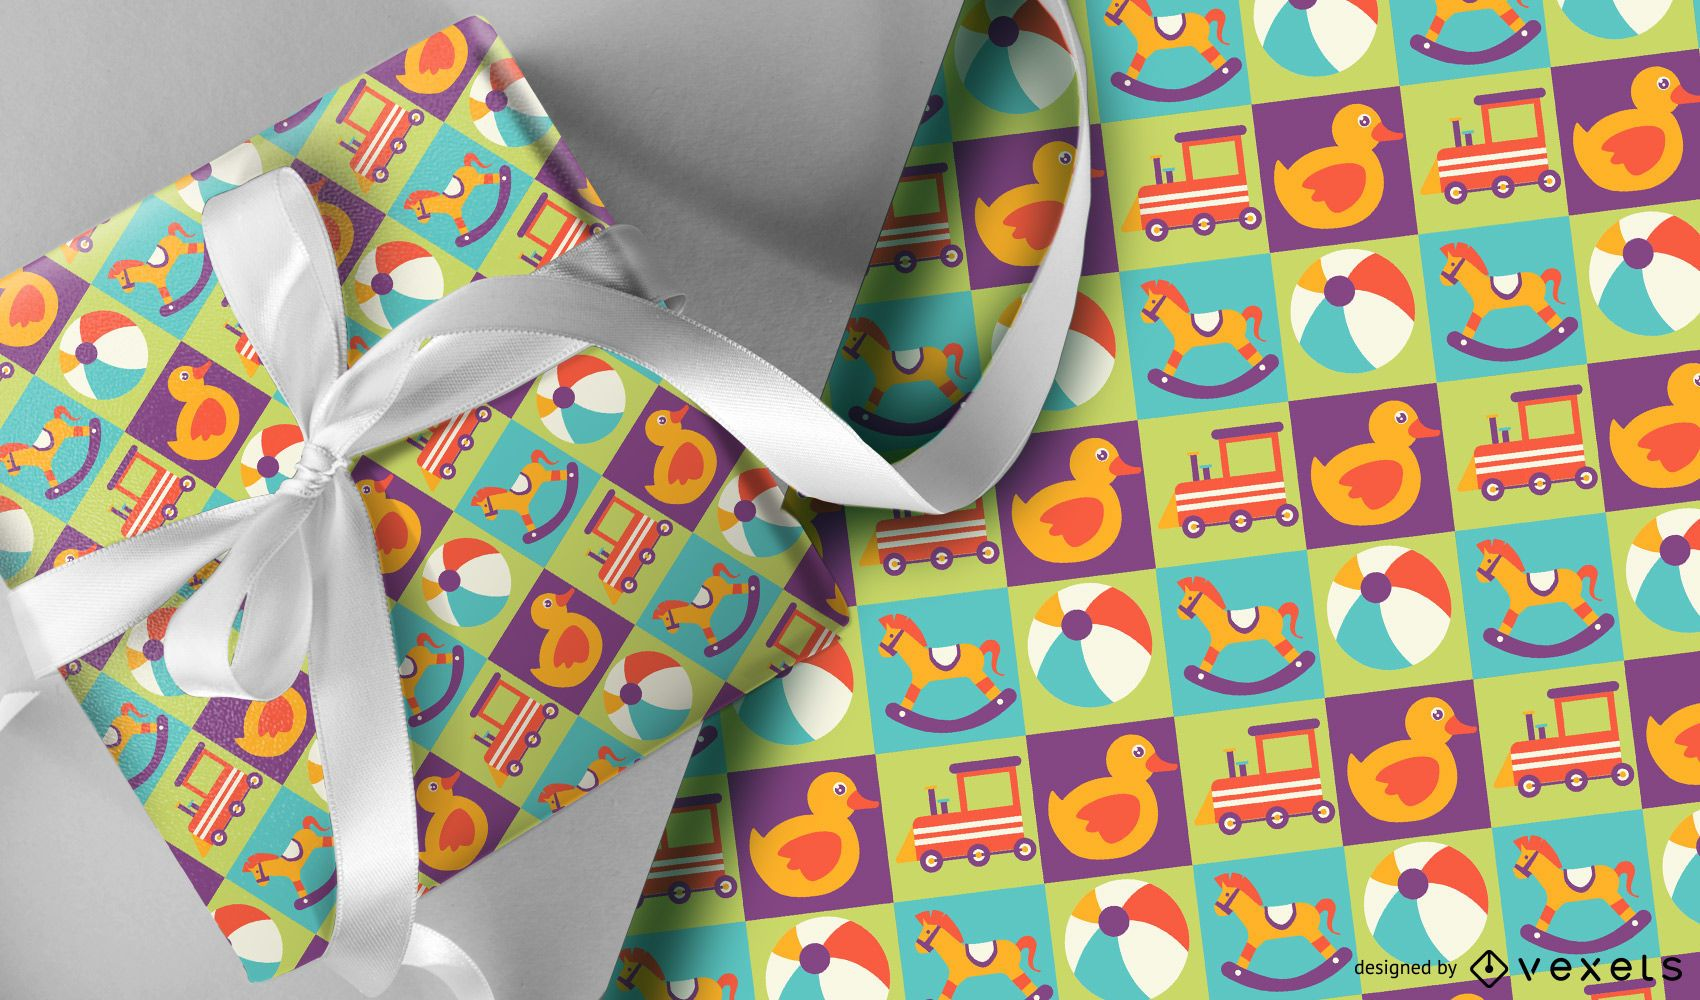 Colorful kids toys pattern design